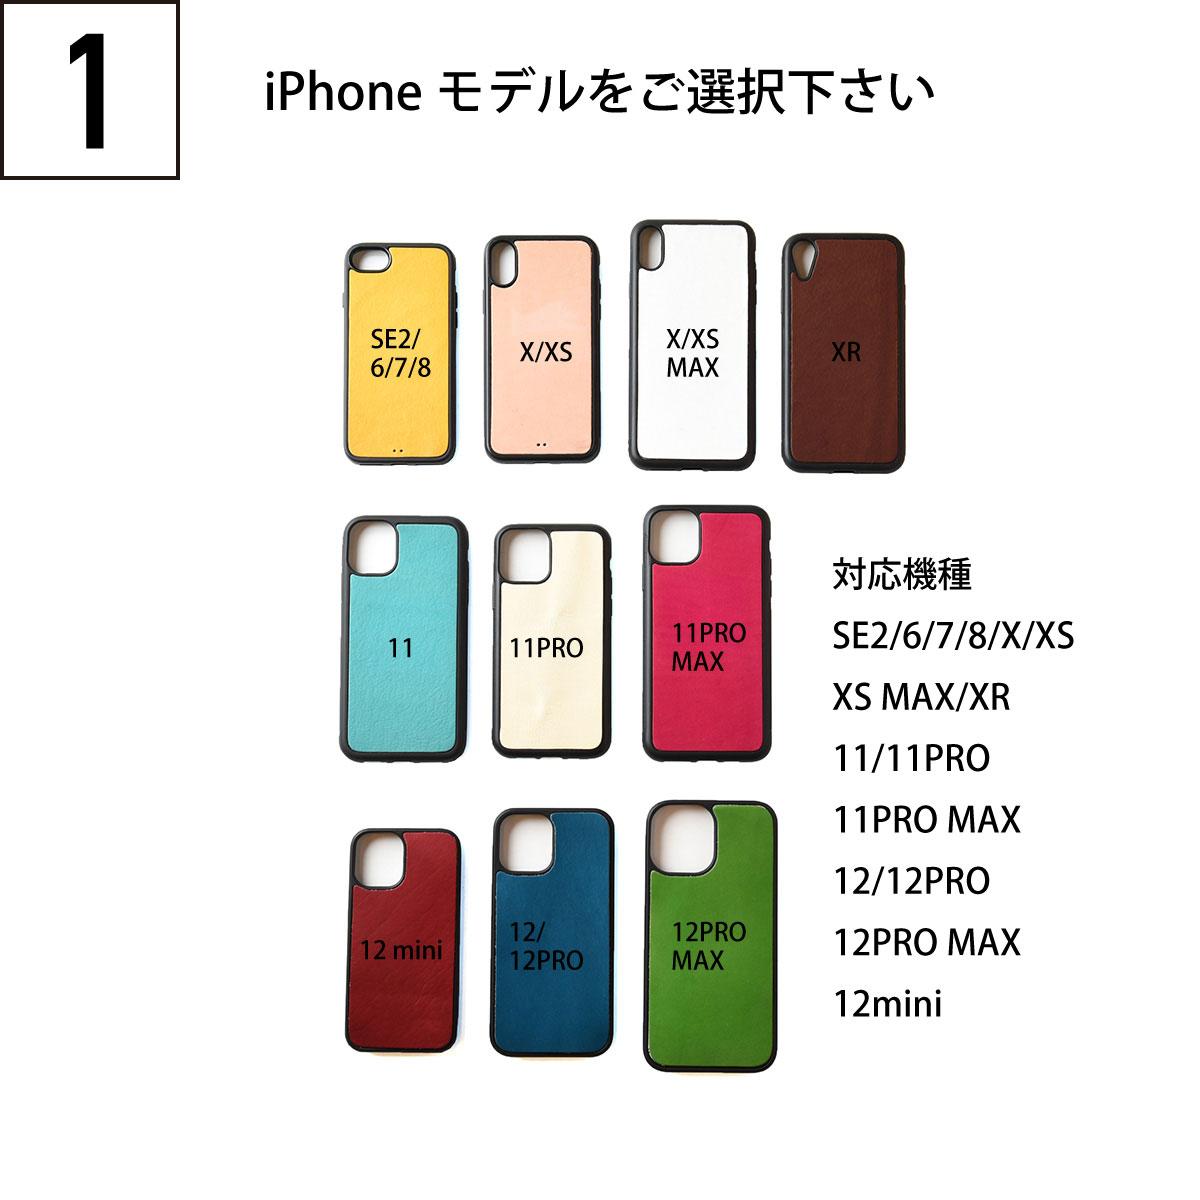 iPhoneOpenCase:   Design C:名入れ刻印/ビッグフォント